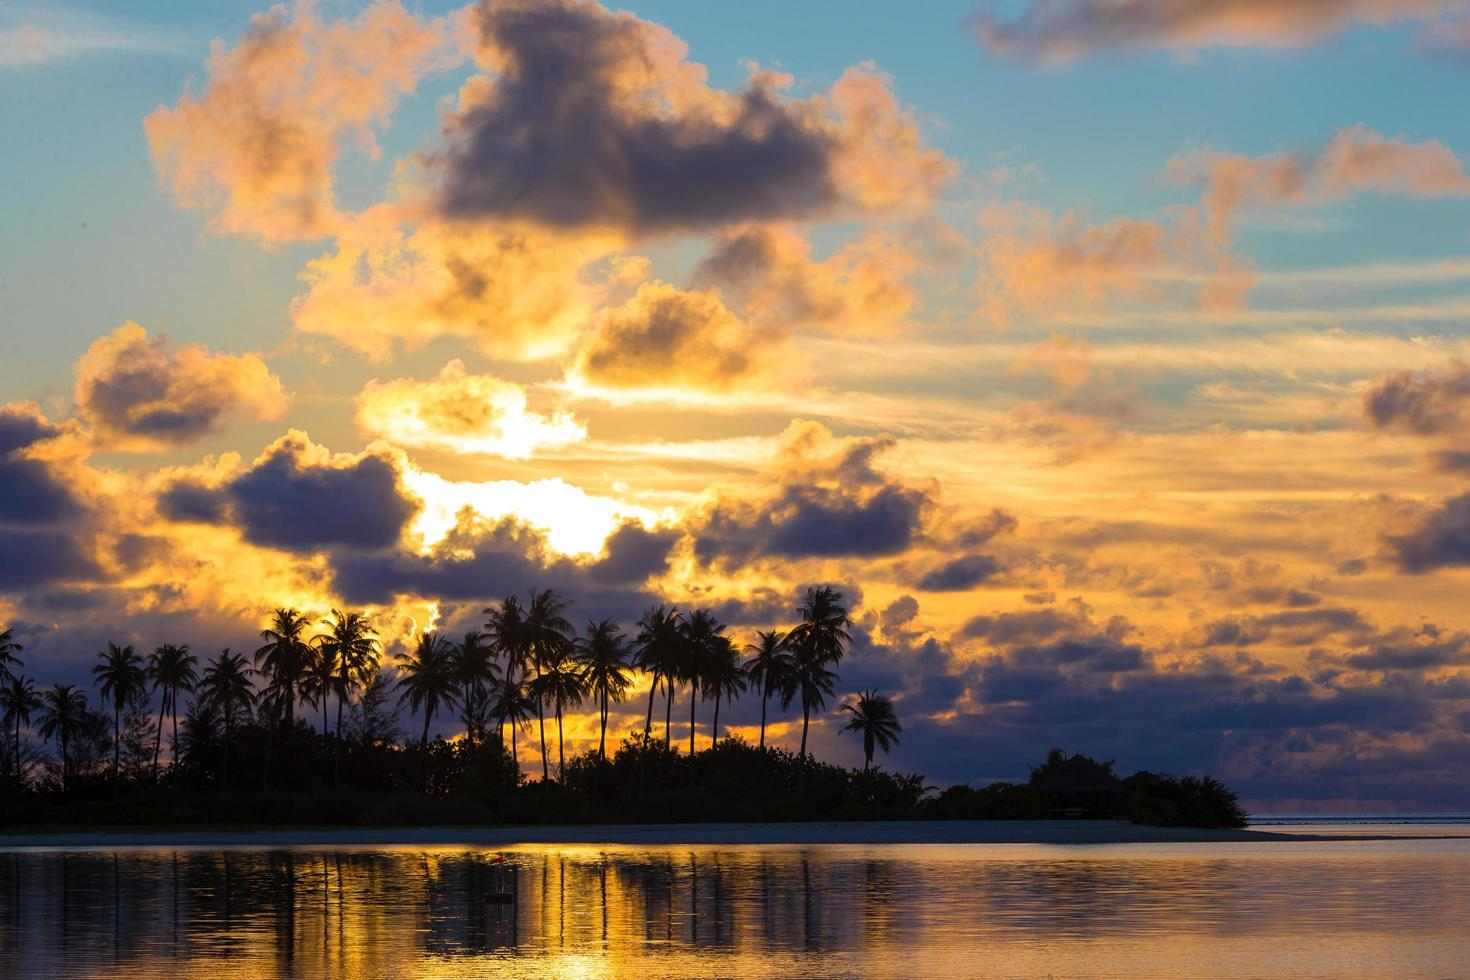 silueta de una isla al atardecer foto